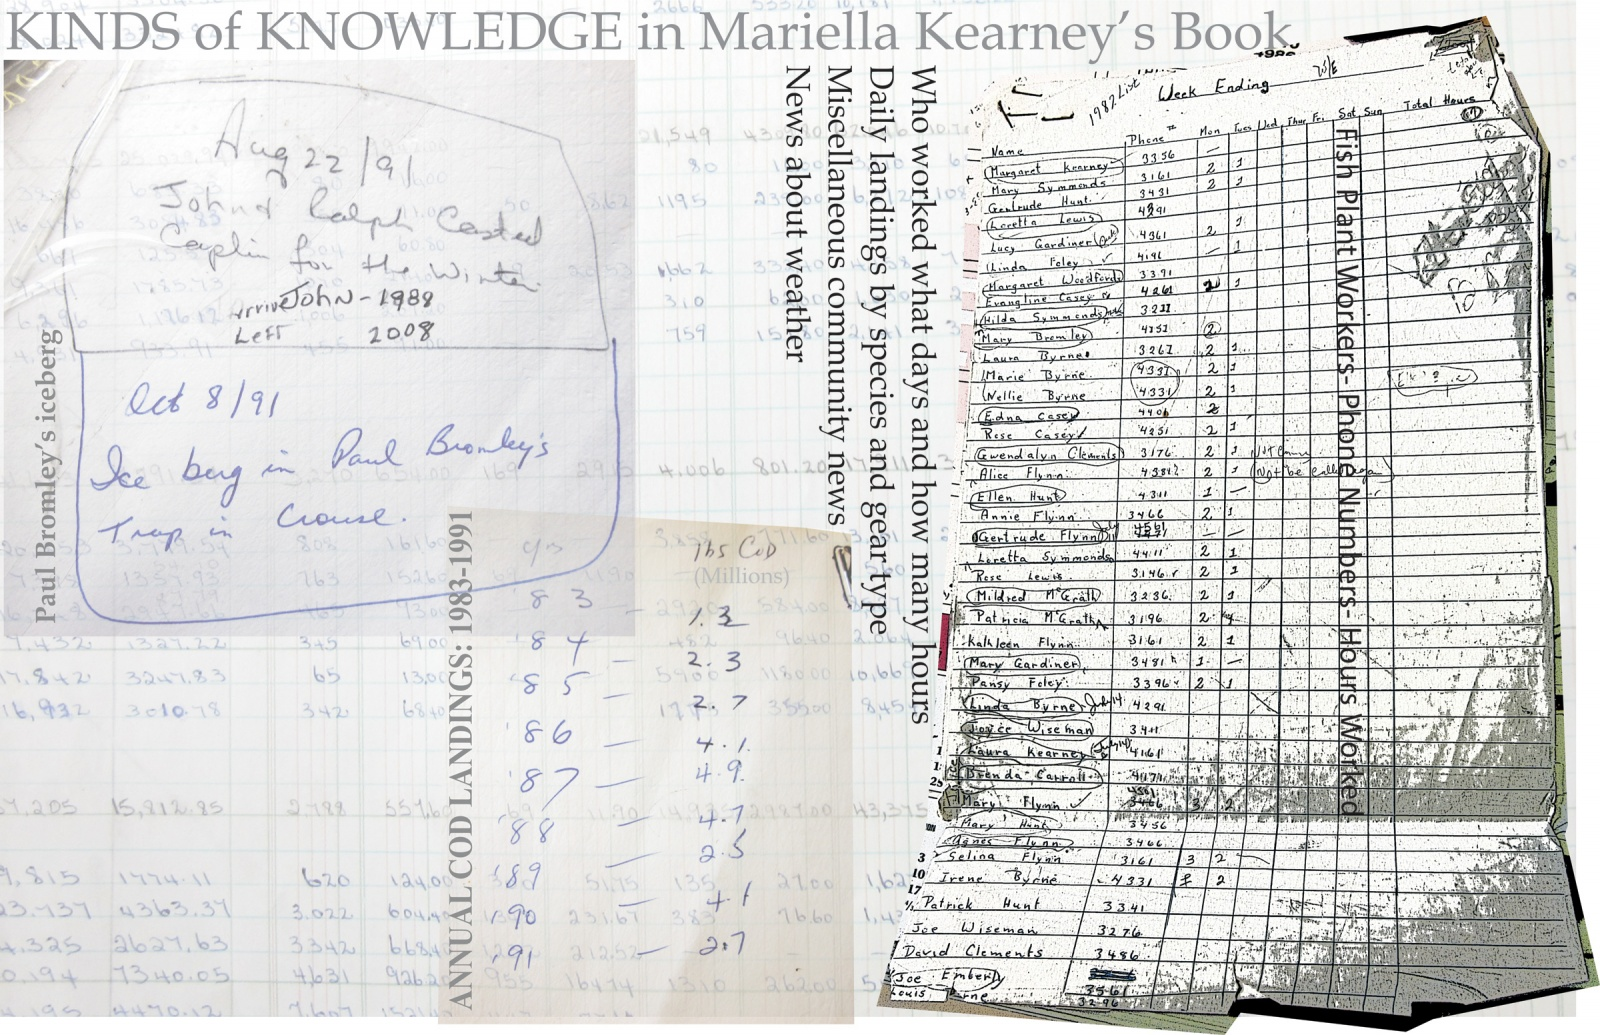 Kinds of Knowledge in Mariella Kearney's Book